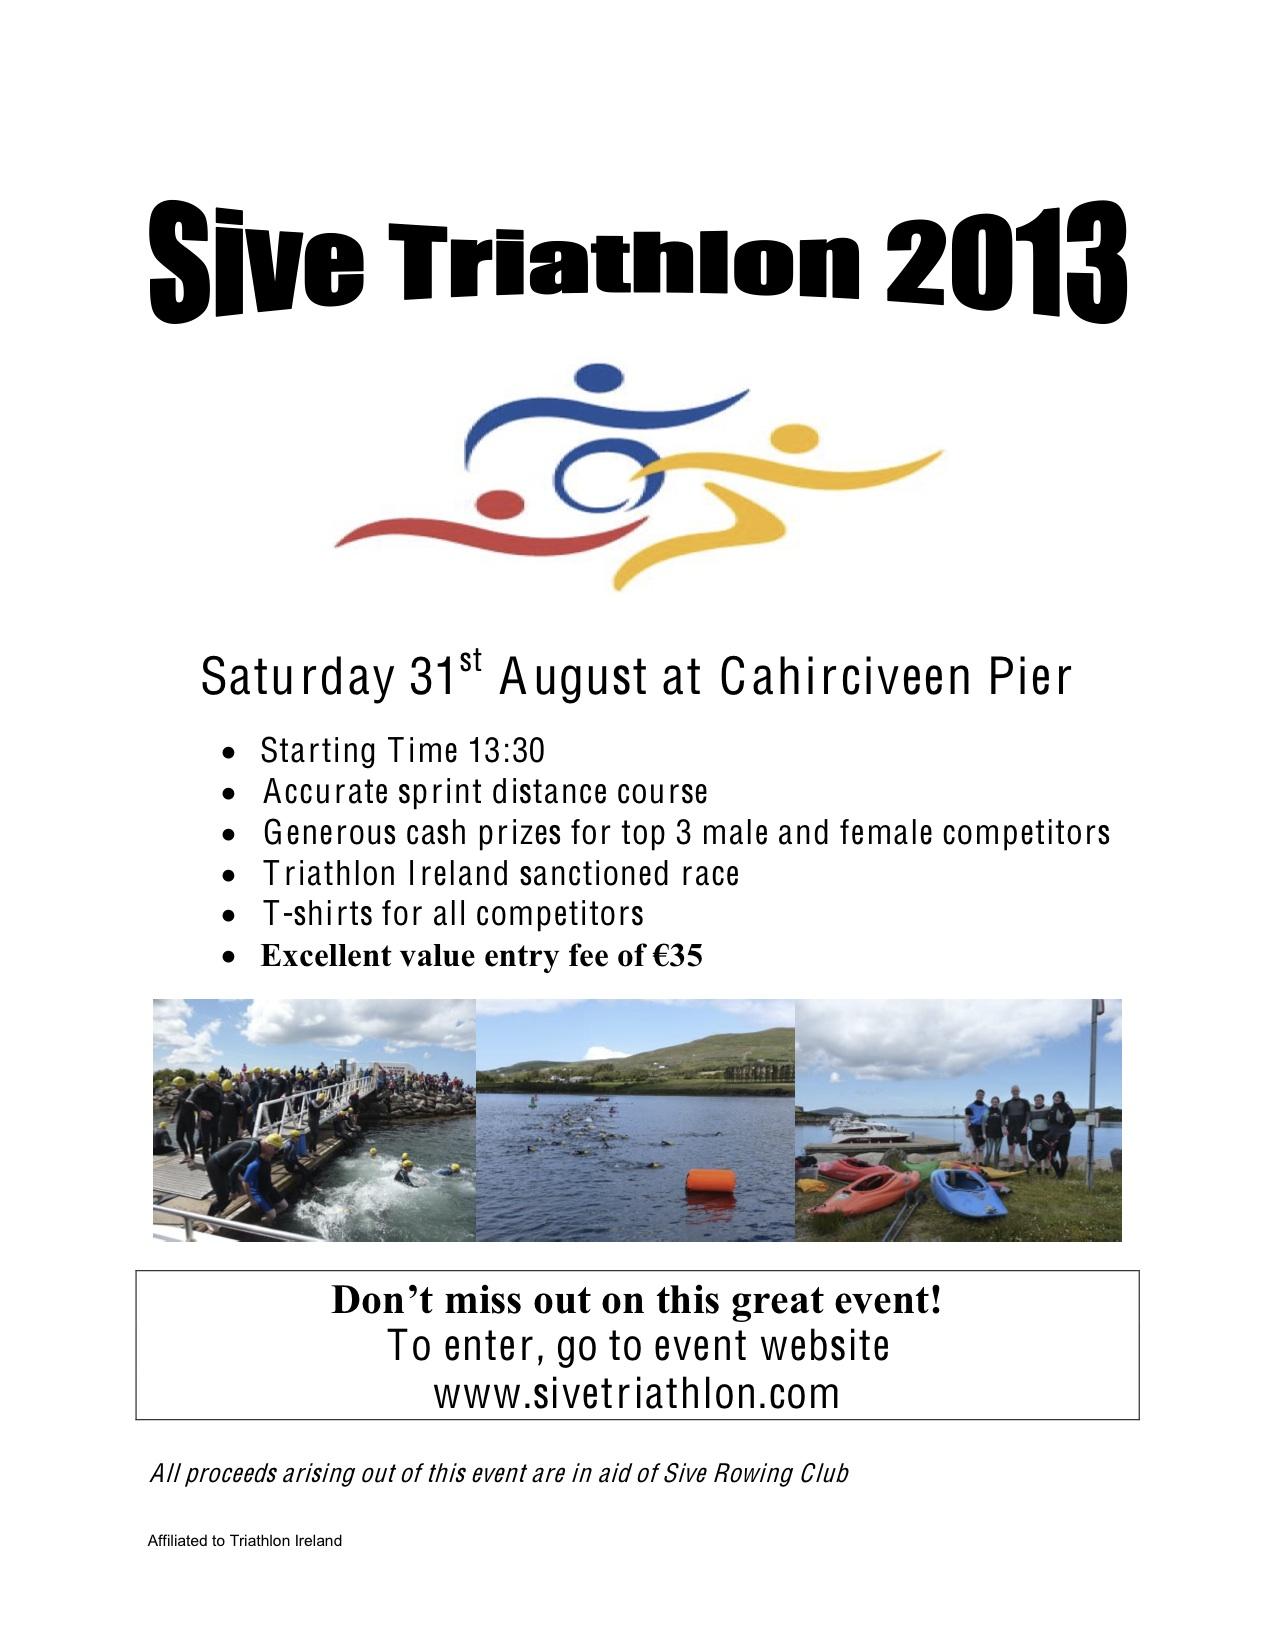 Sive Triathlon Event Flyer_130726